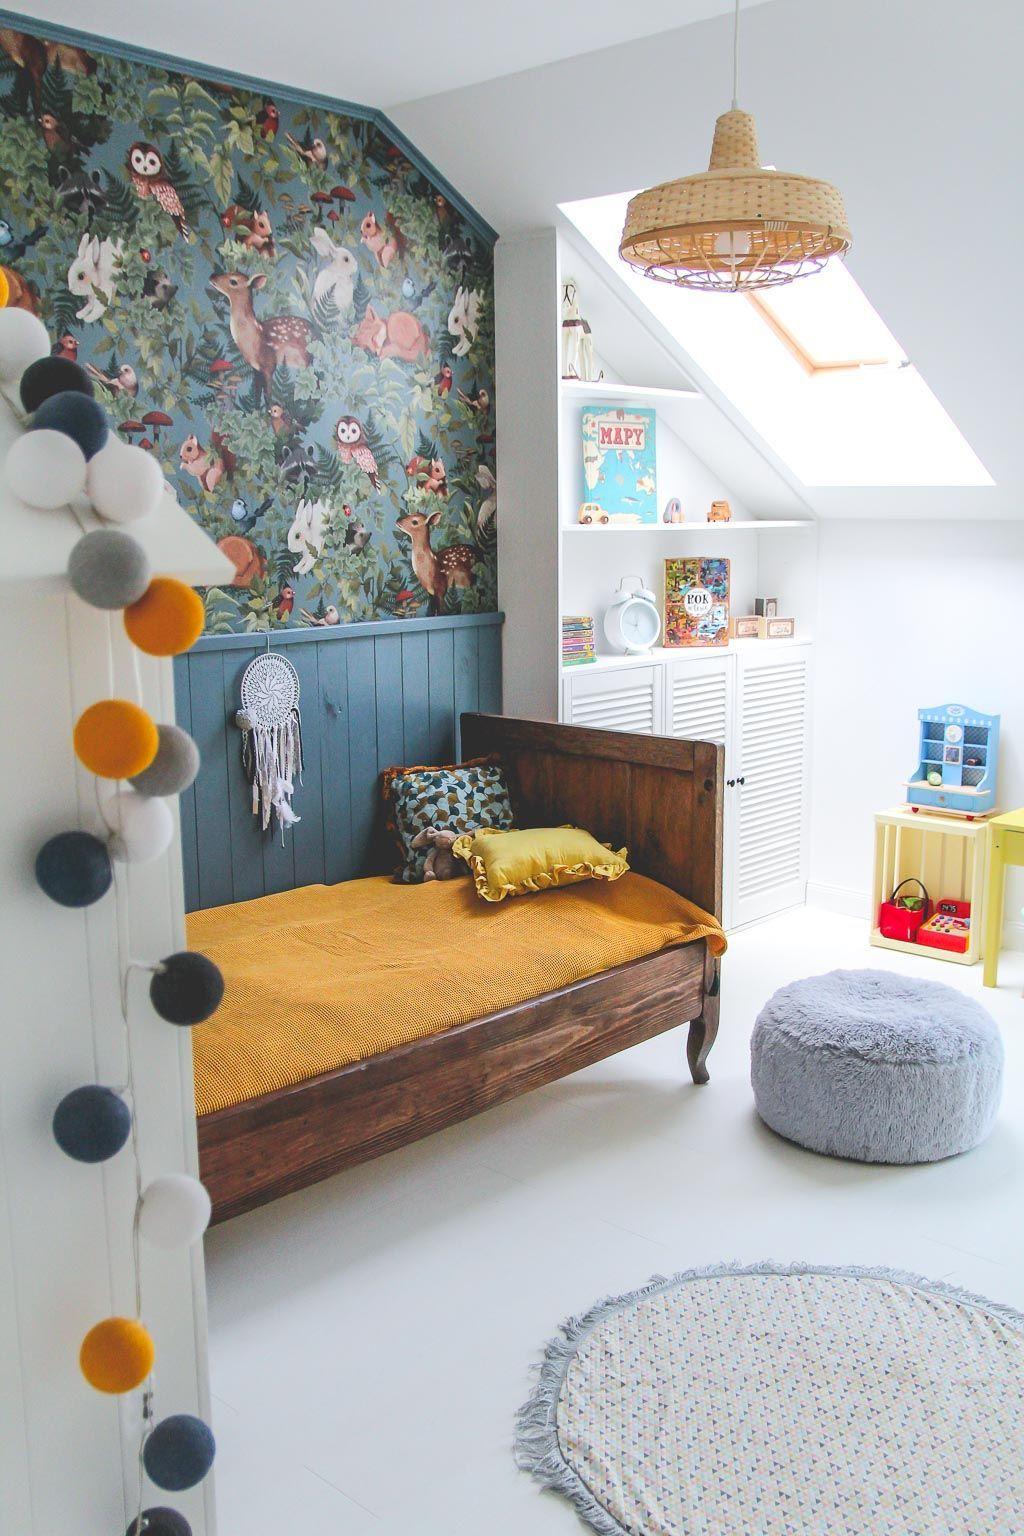 Designing The Ultimate Kids Bedroom Decor Wallpapers Blog Circu Magical Furniture Kids Bedroom Decor Cozy Bedroom Design Baby Room Decor